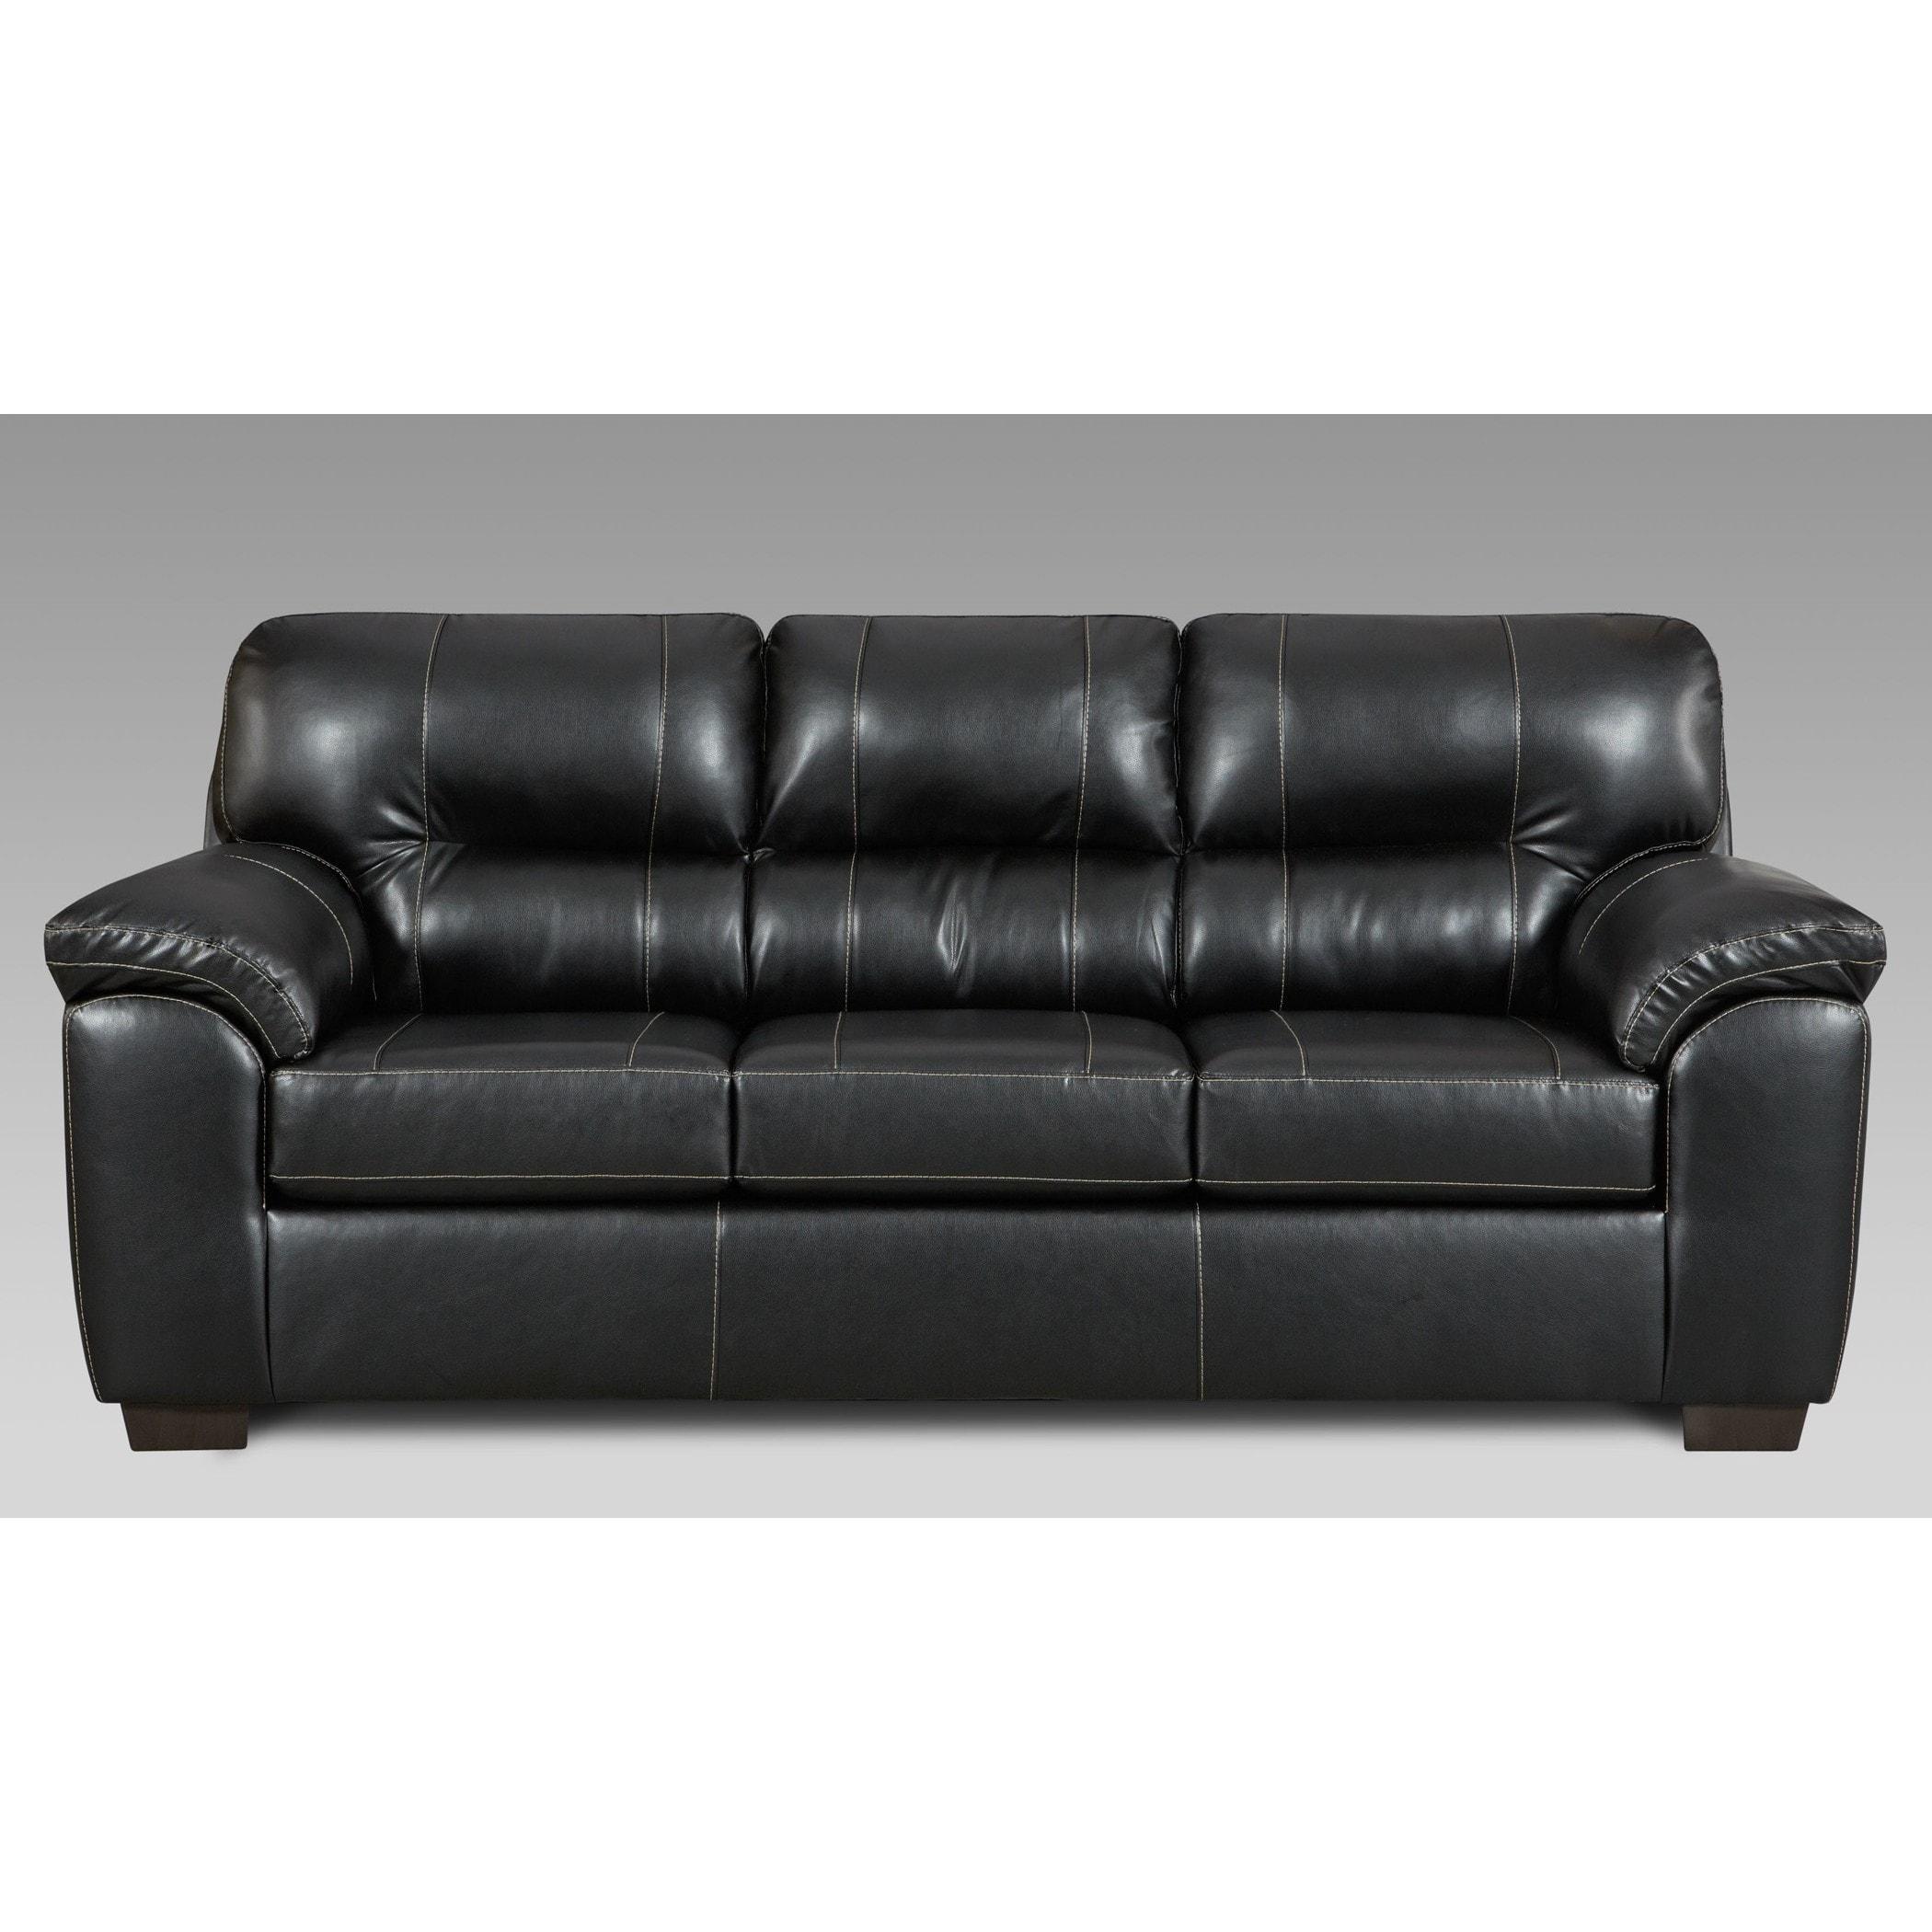 Black Sleeper Sofa Online At Our Best Living Room Furniture Deals